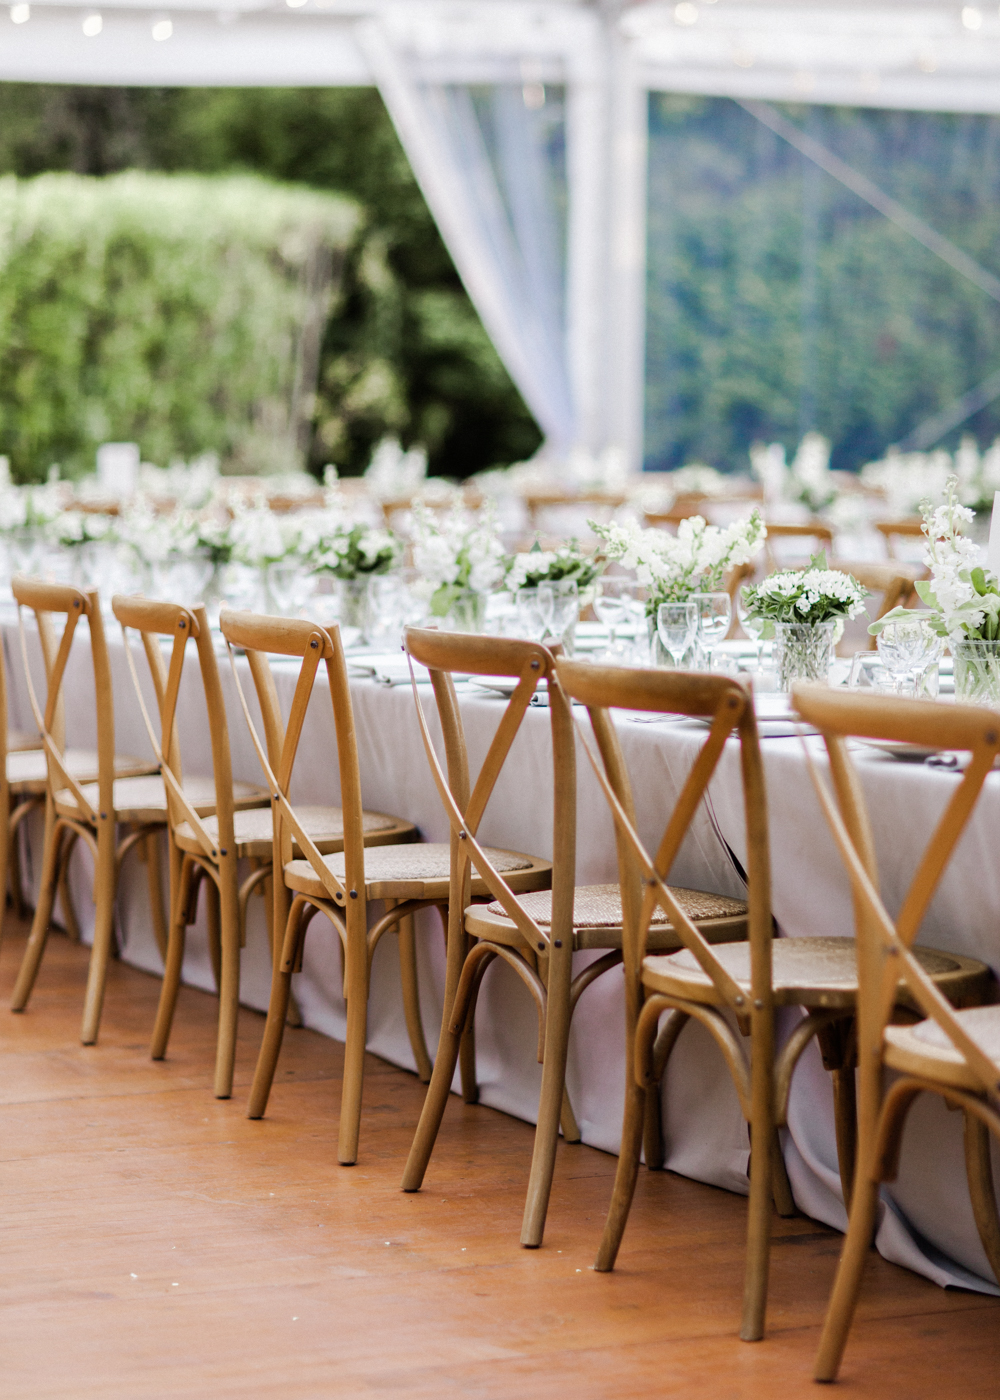 Provence_Wedding_(c)_Rory_Wylie-130.jpg